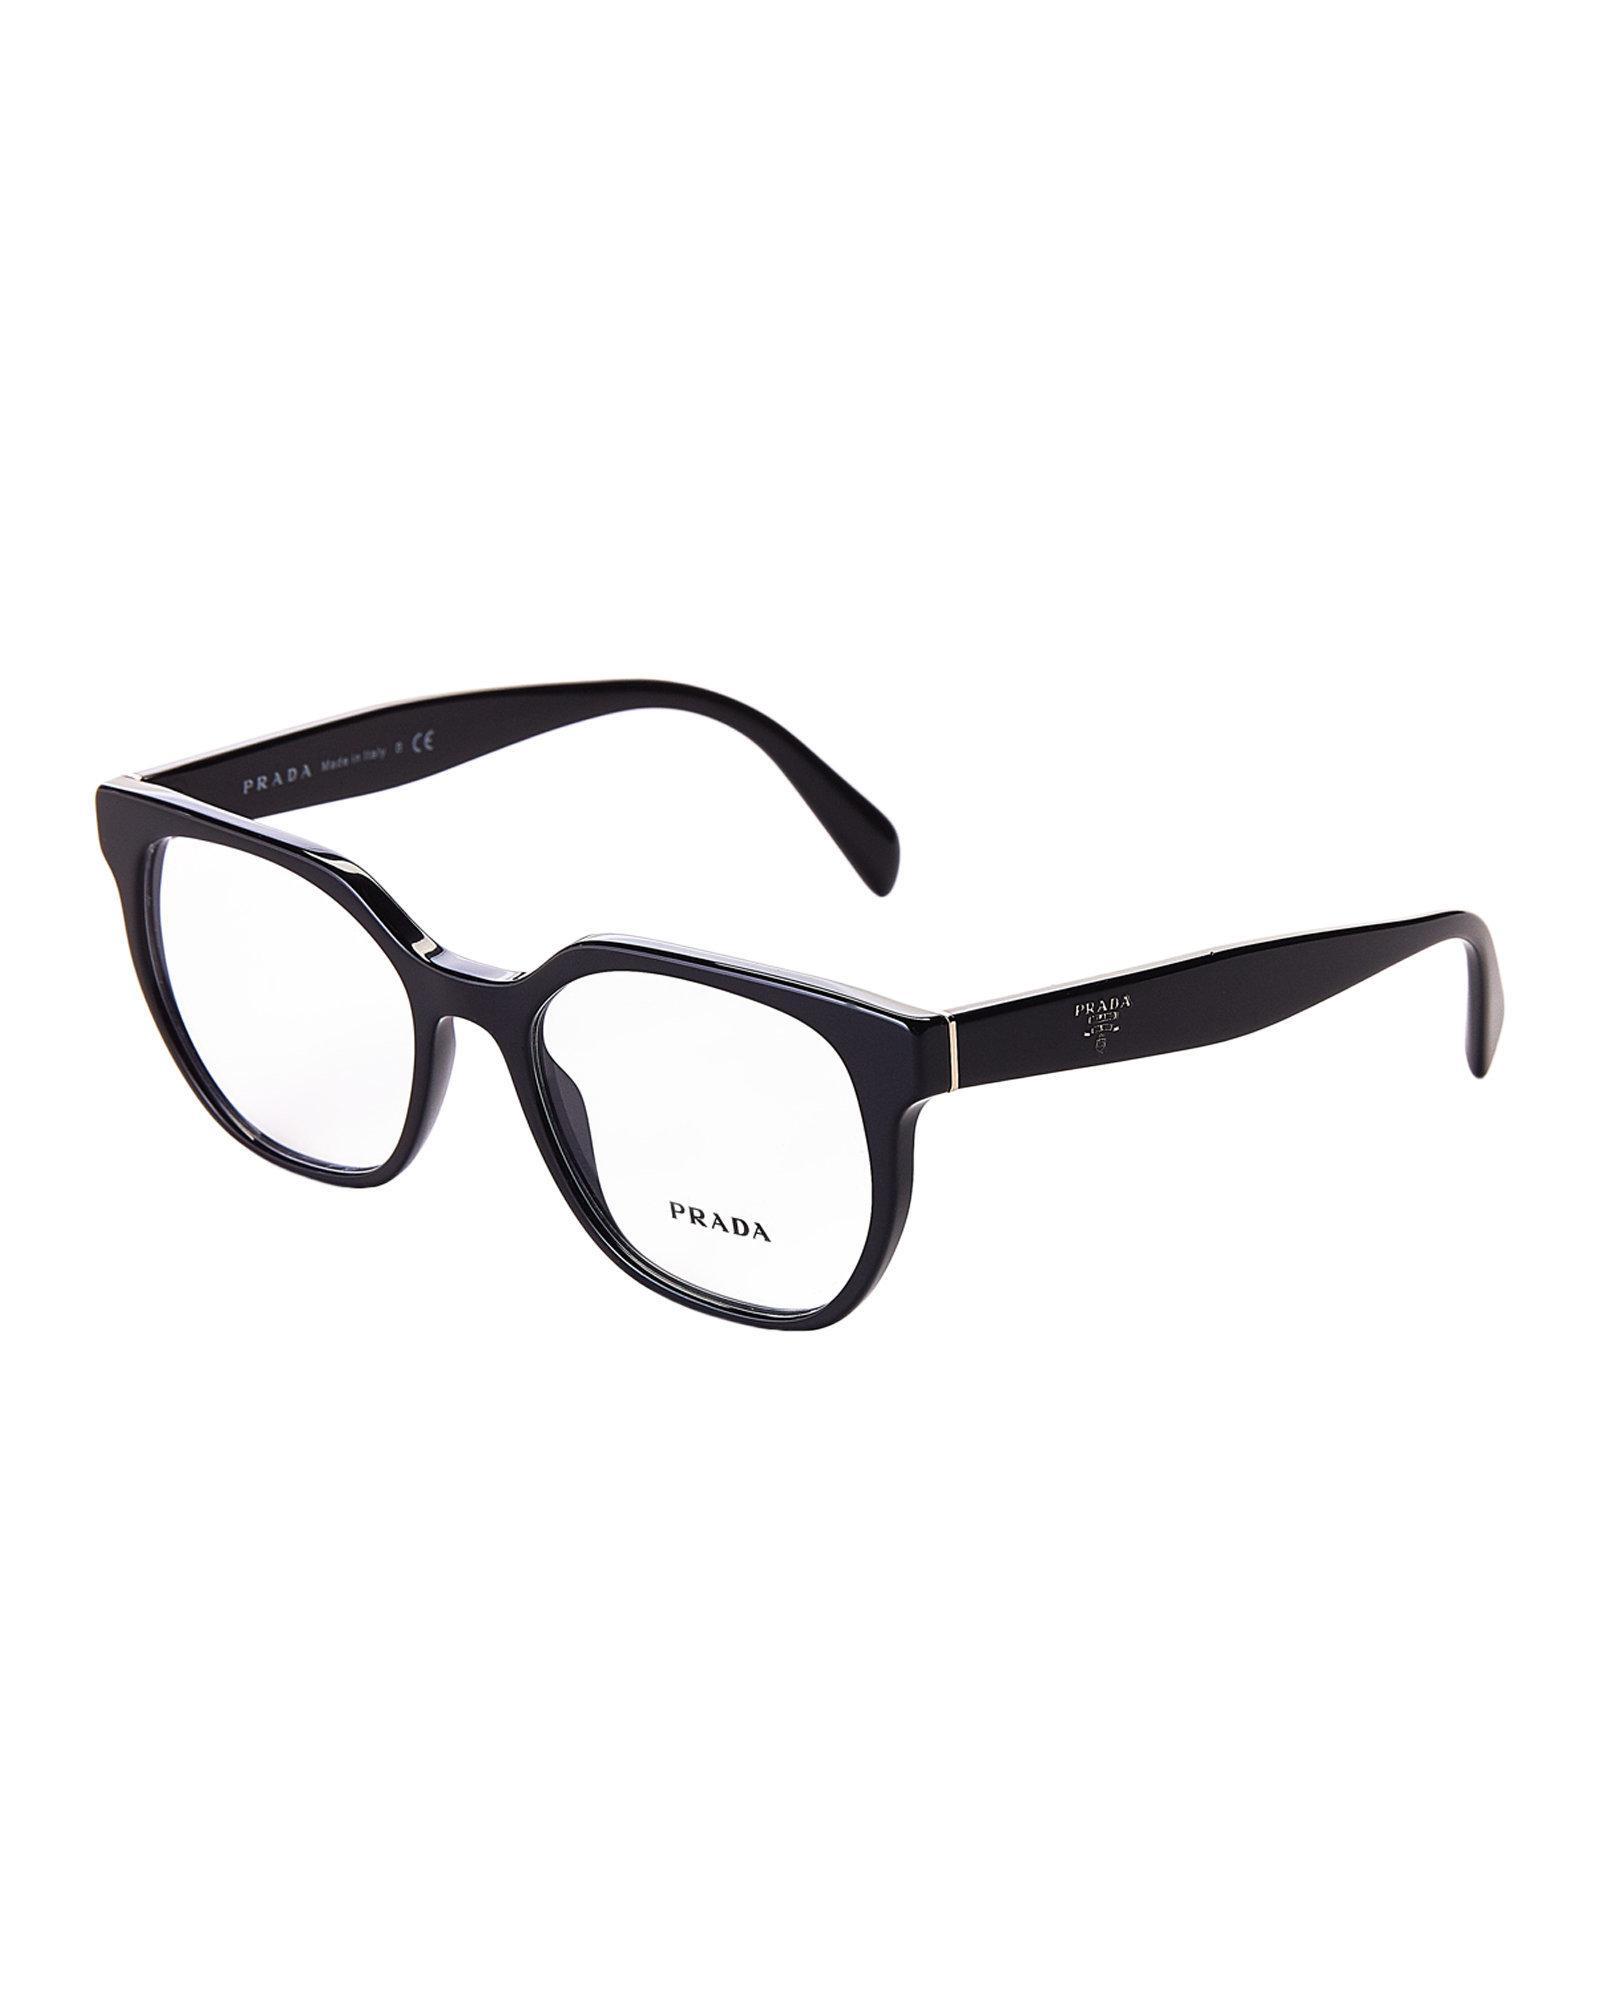 Lyst - Prada Vpr 02u Black Round Optical Frames in Black